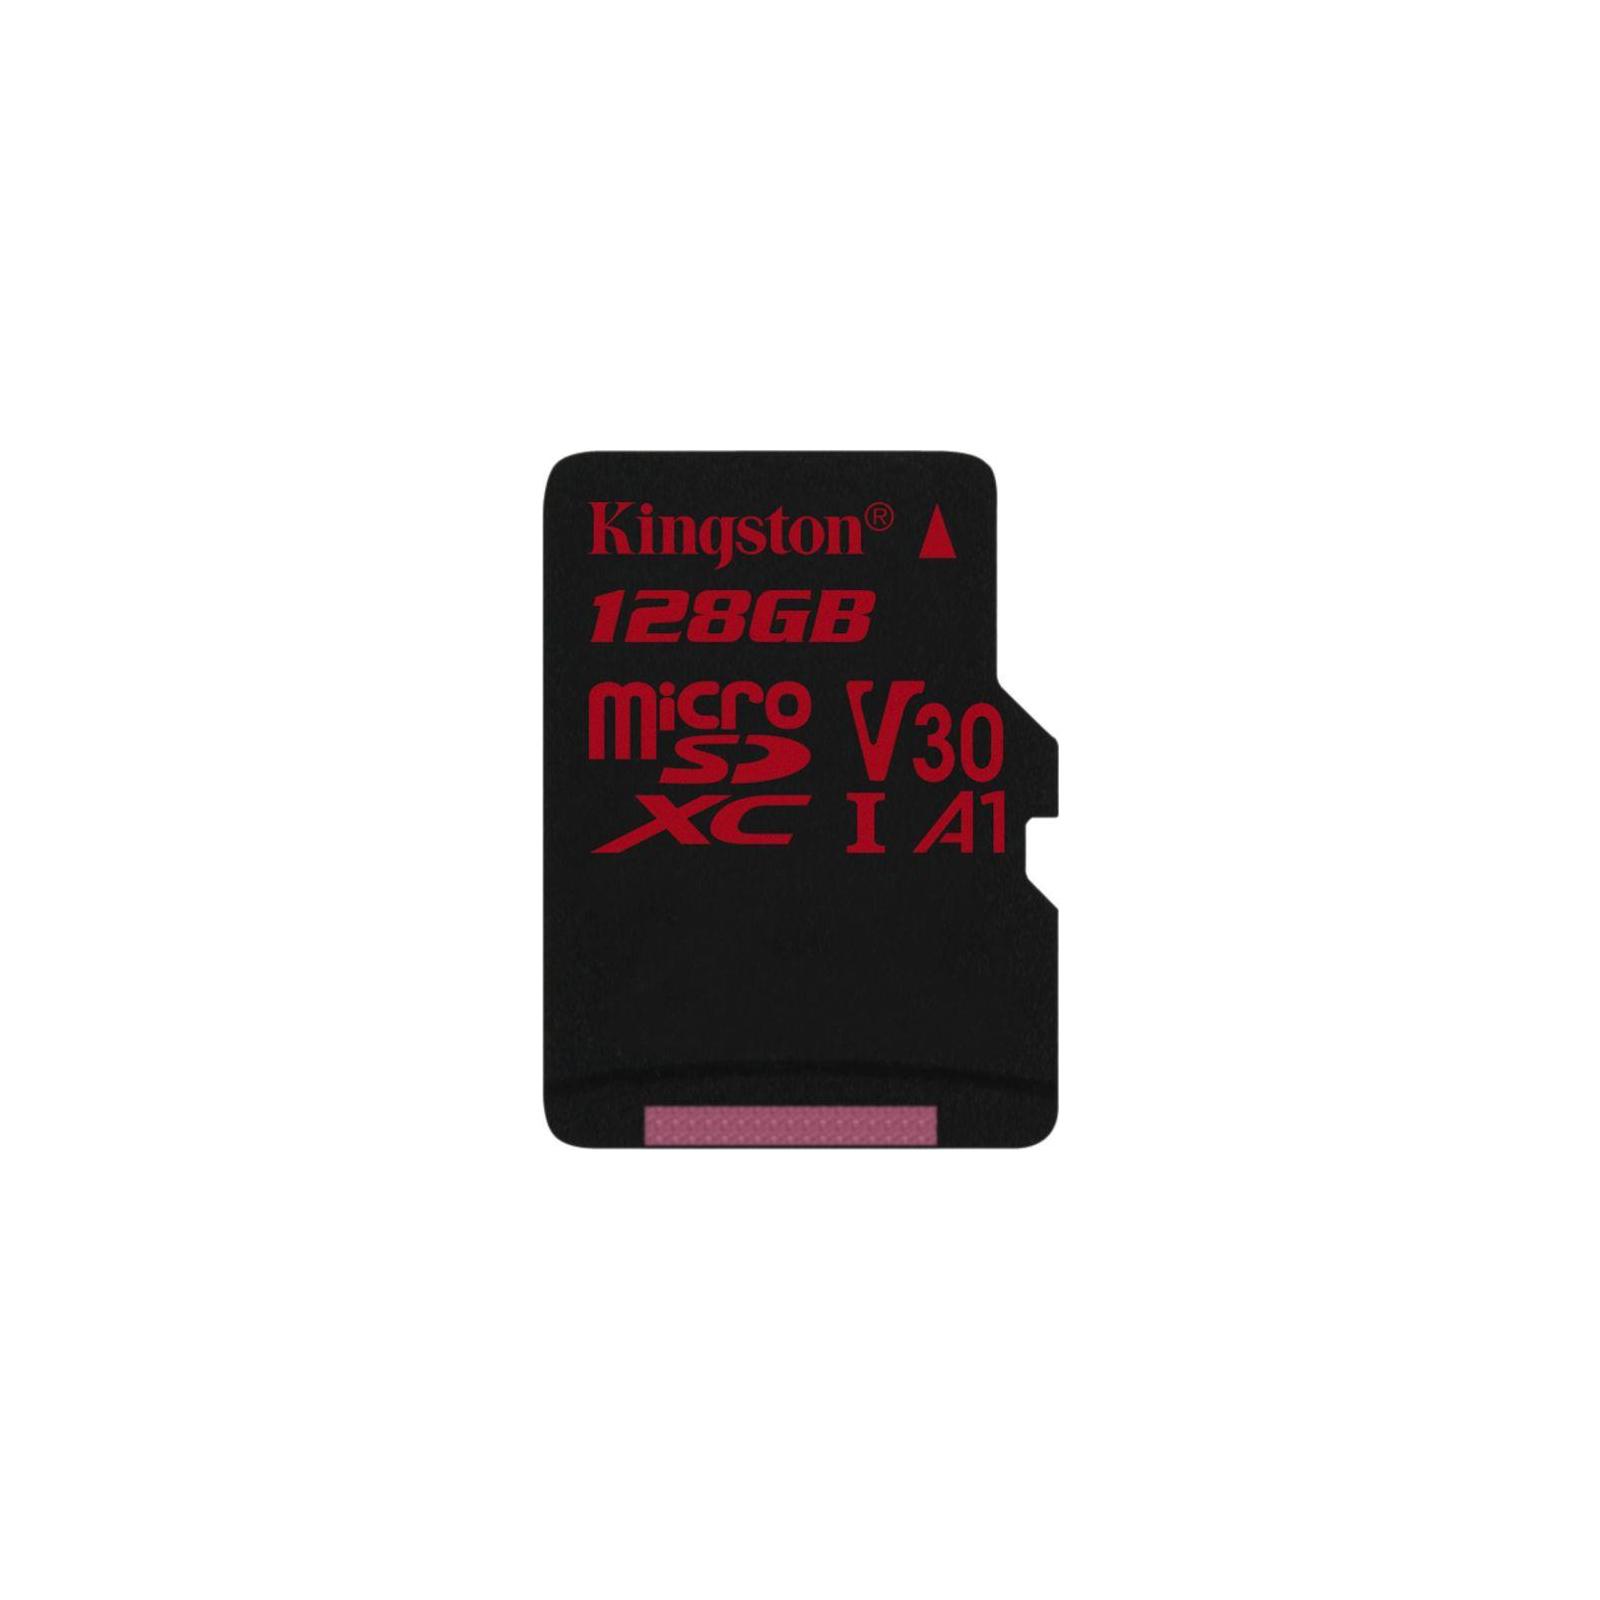 Карта памяти Kingston 128GB microSDXC class 10 UHS-I U3 (SDCR/128GBSP)